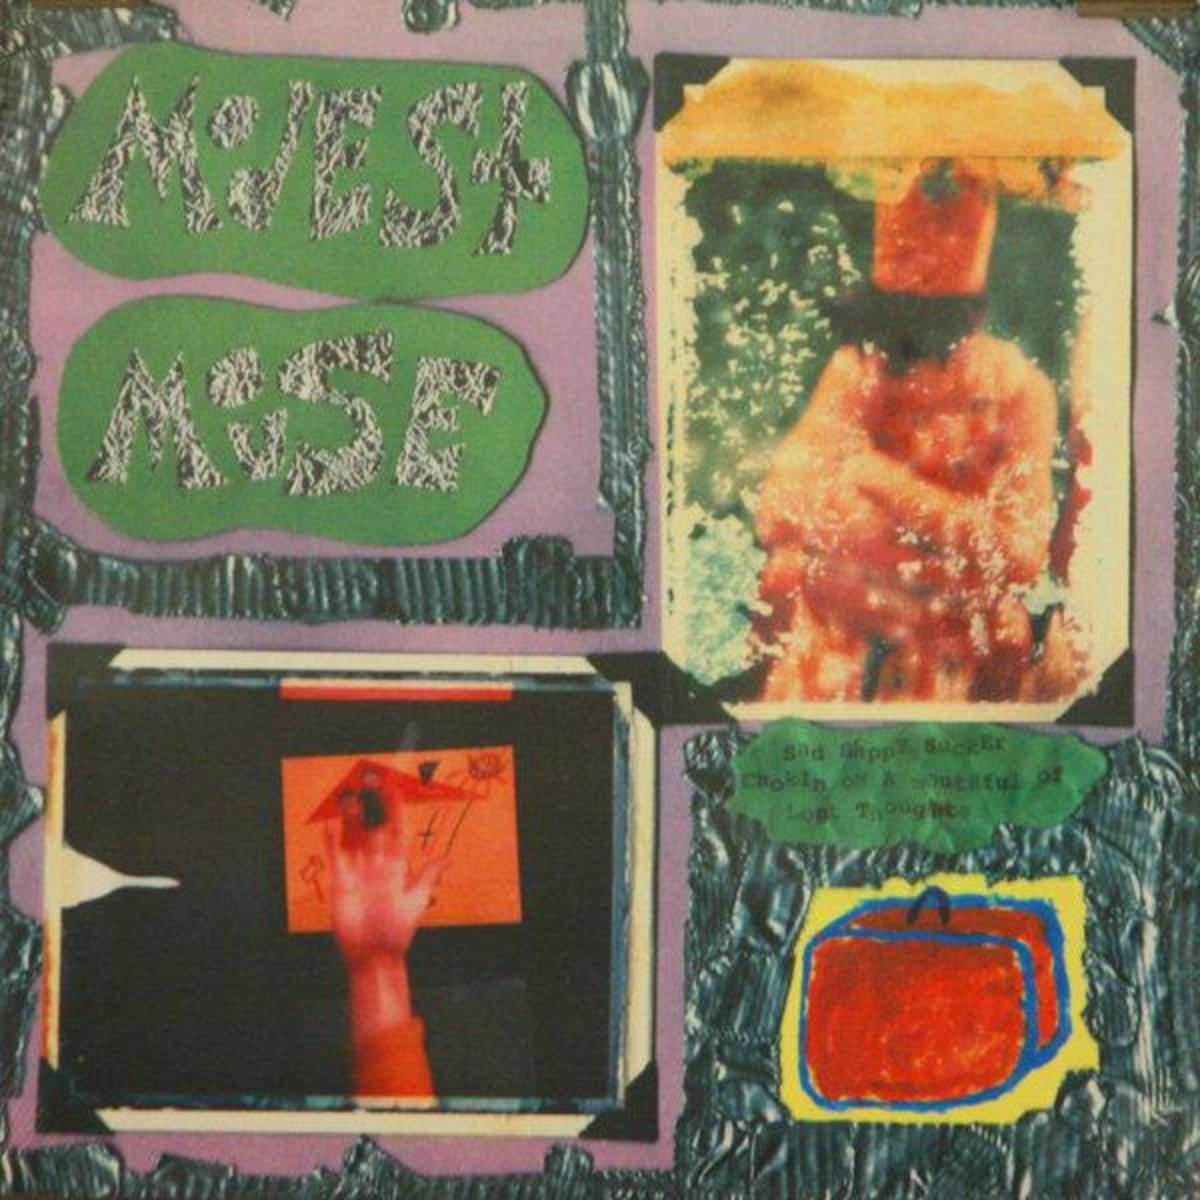 Sad Sappy Sucker CD